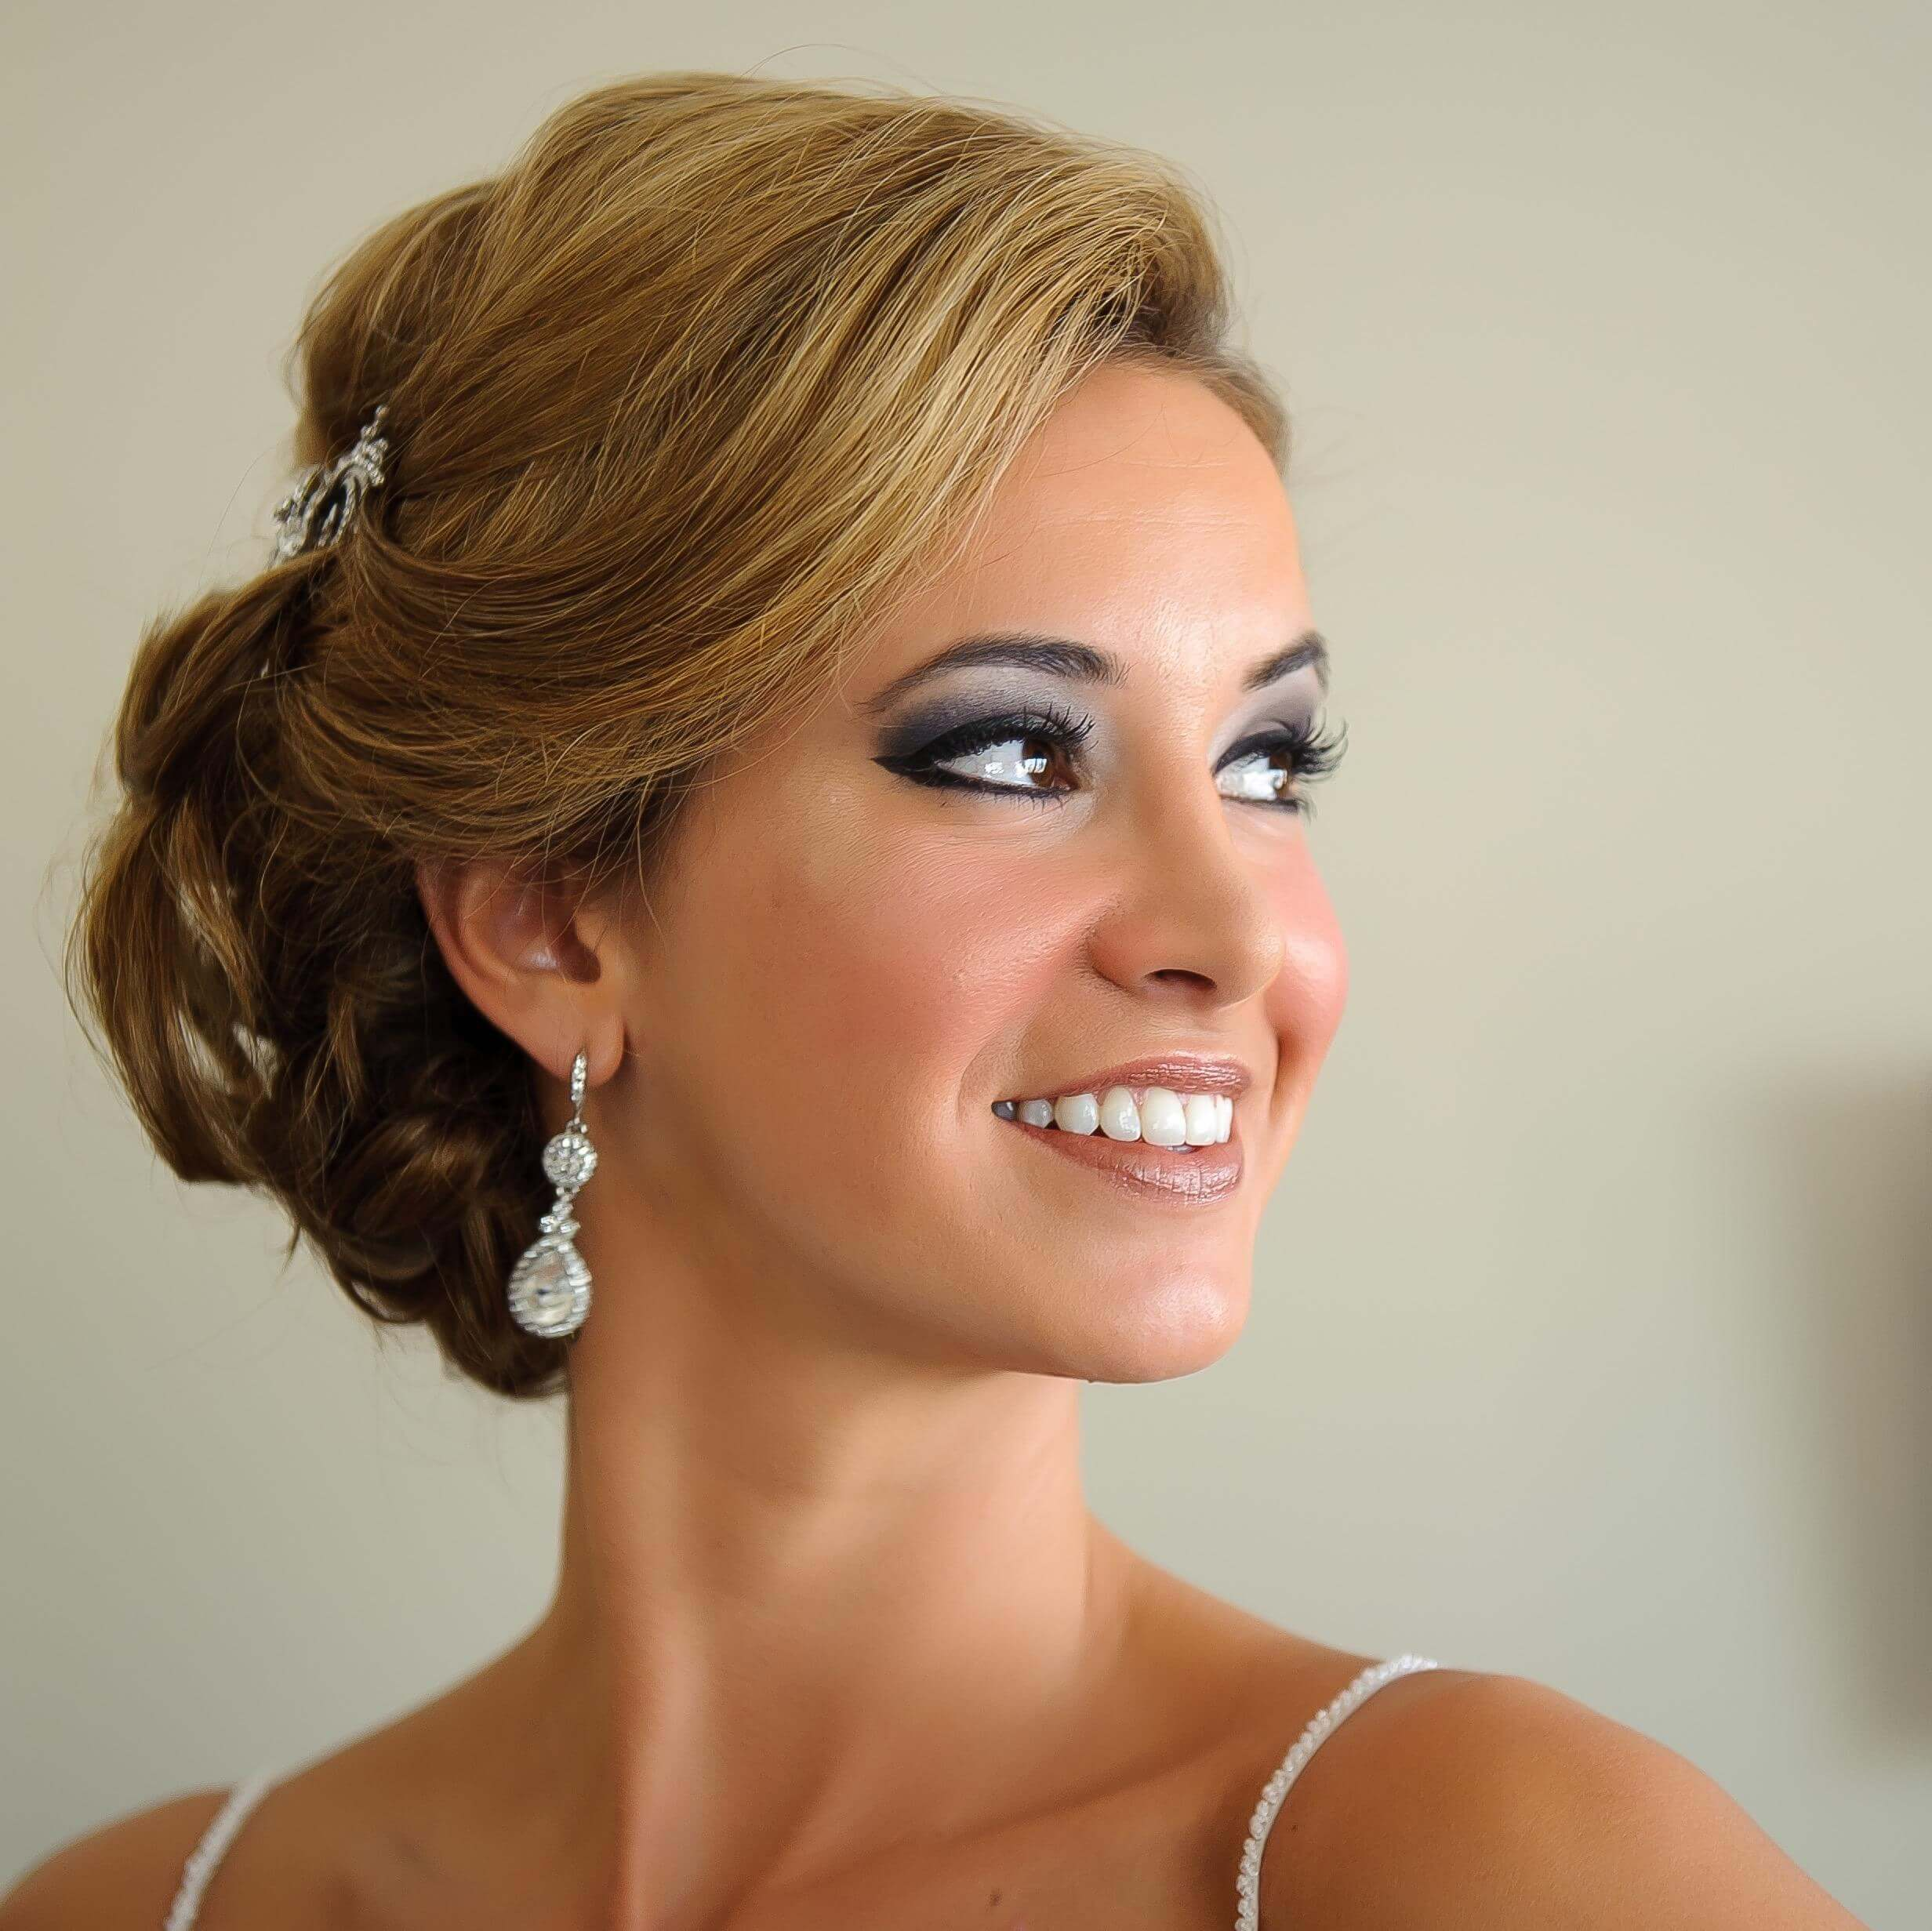 Charlotte and Company Award-Winning Hair and Makeup Artists